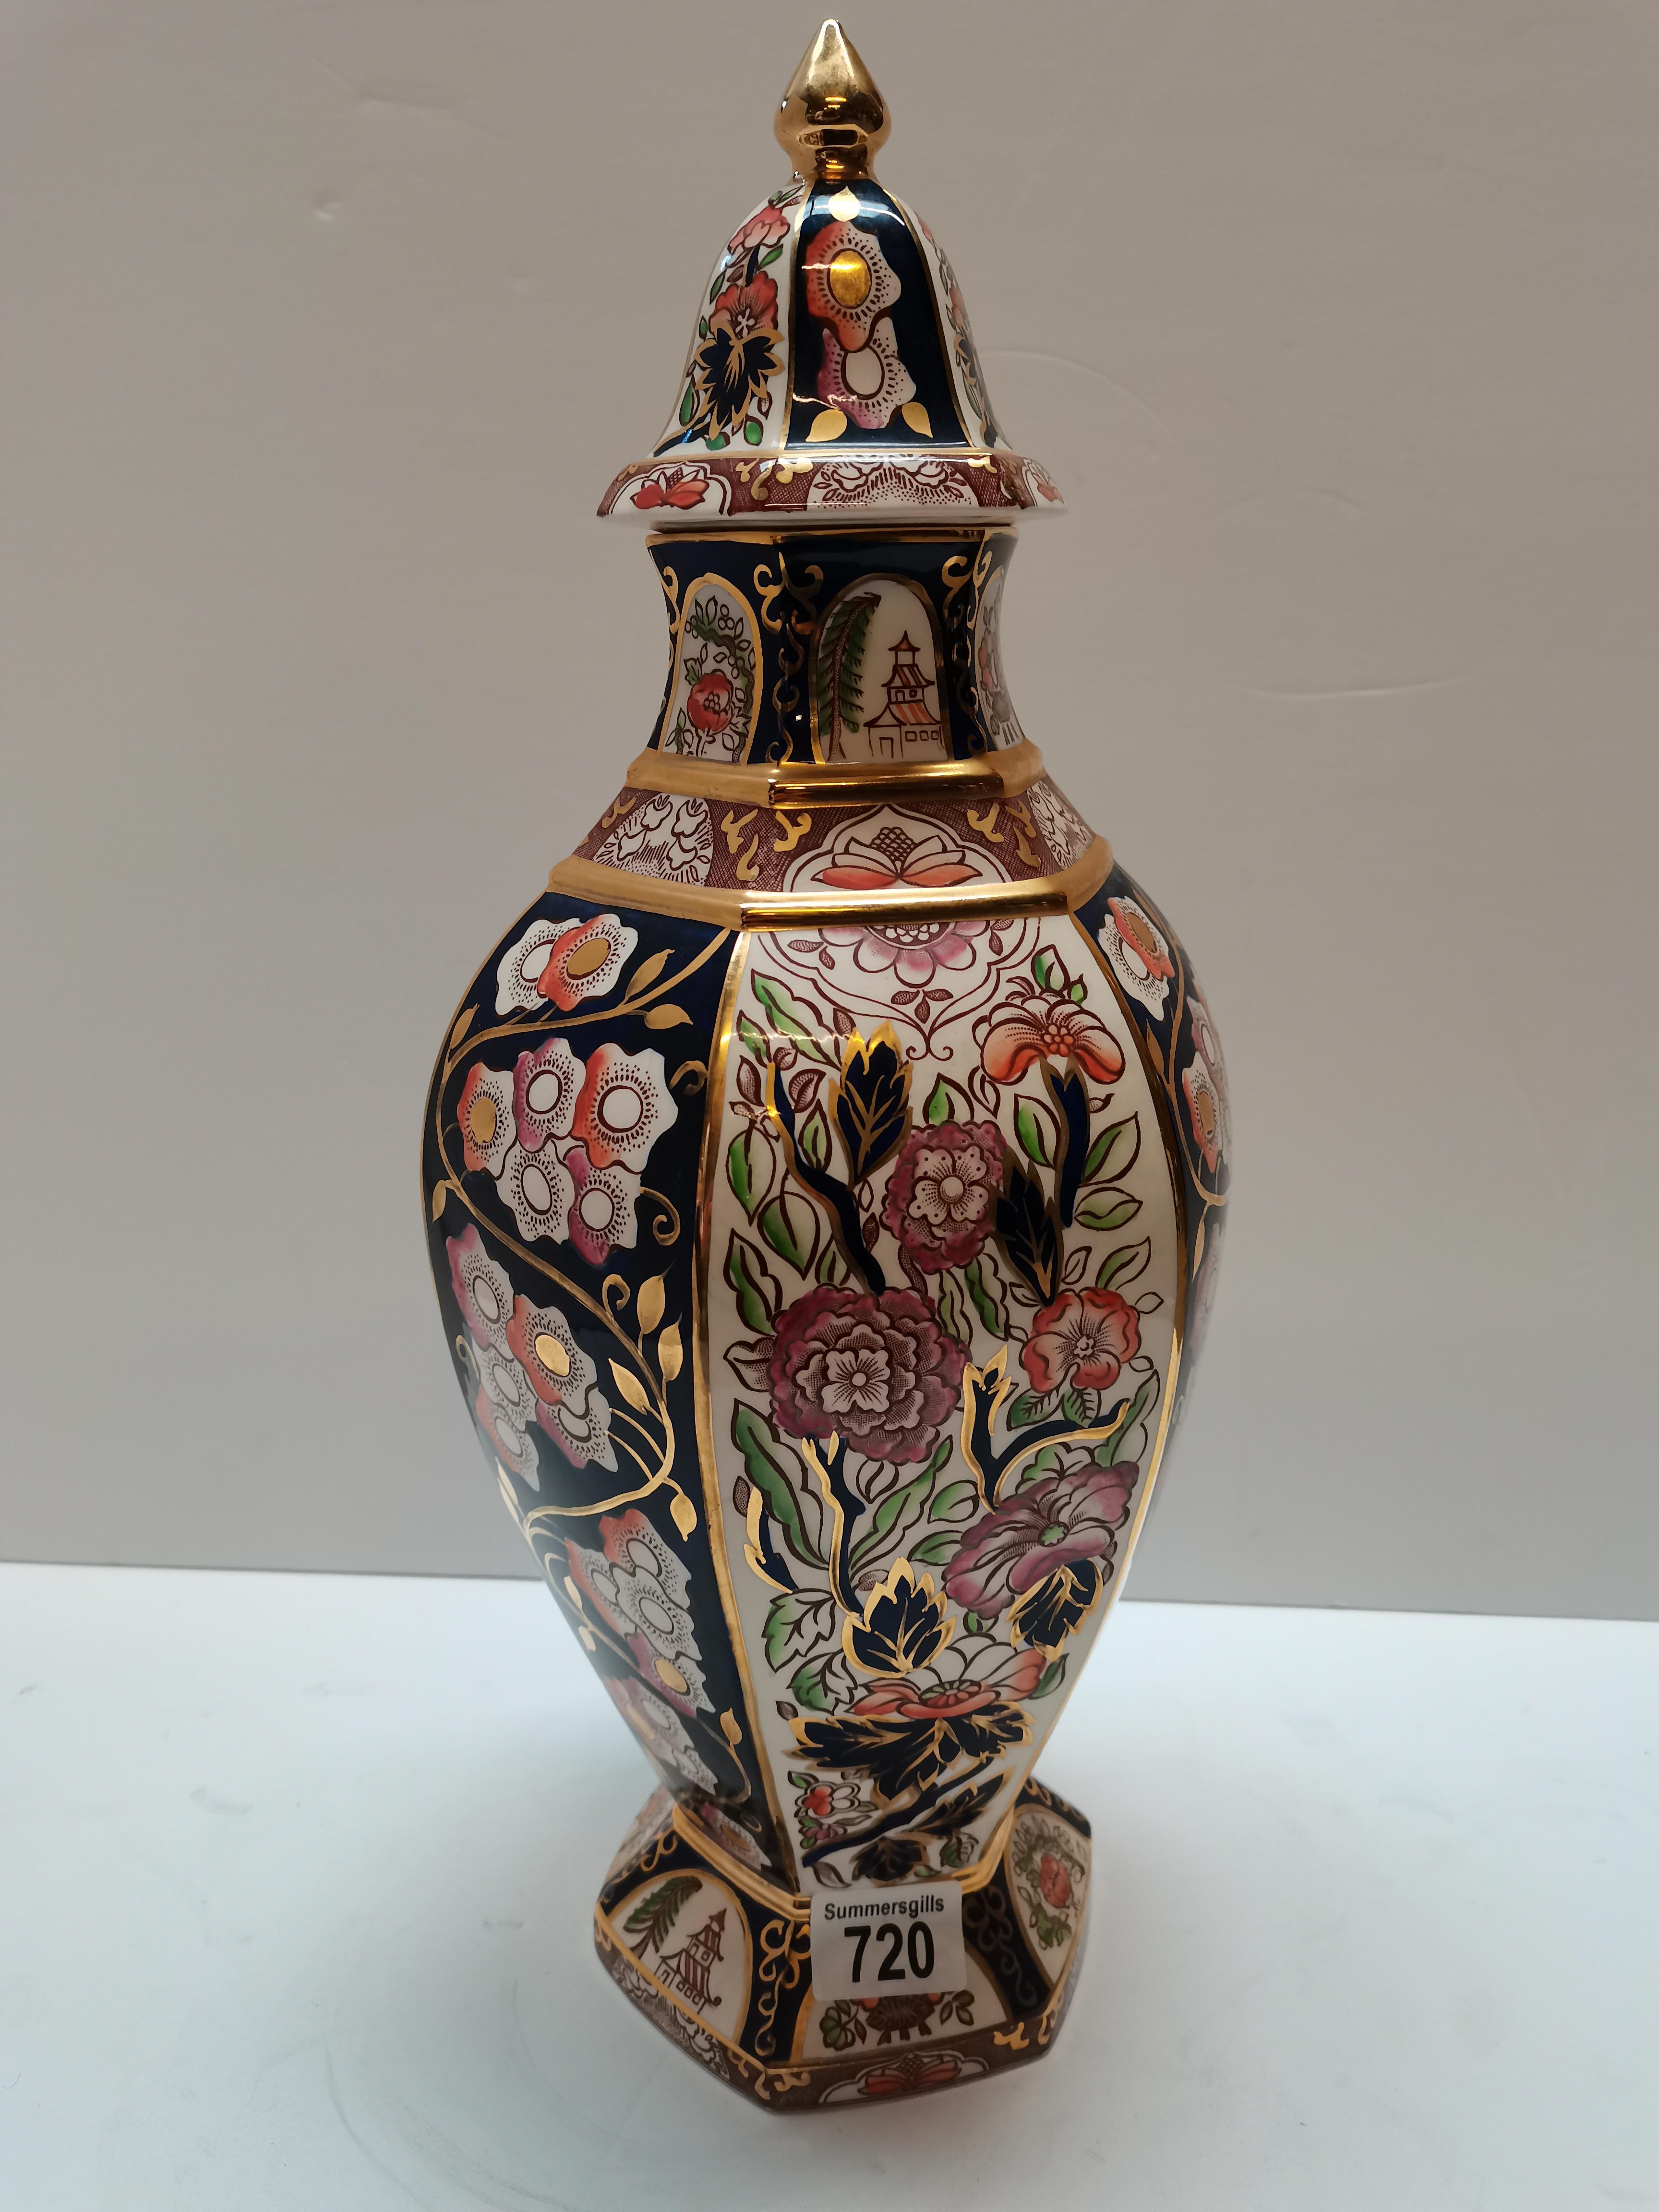 Masons Hall vase ltd. edt. 348/ 1999 ex con 48cm - Image 6 of 6